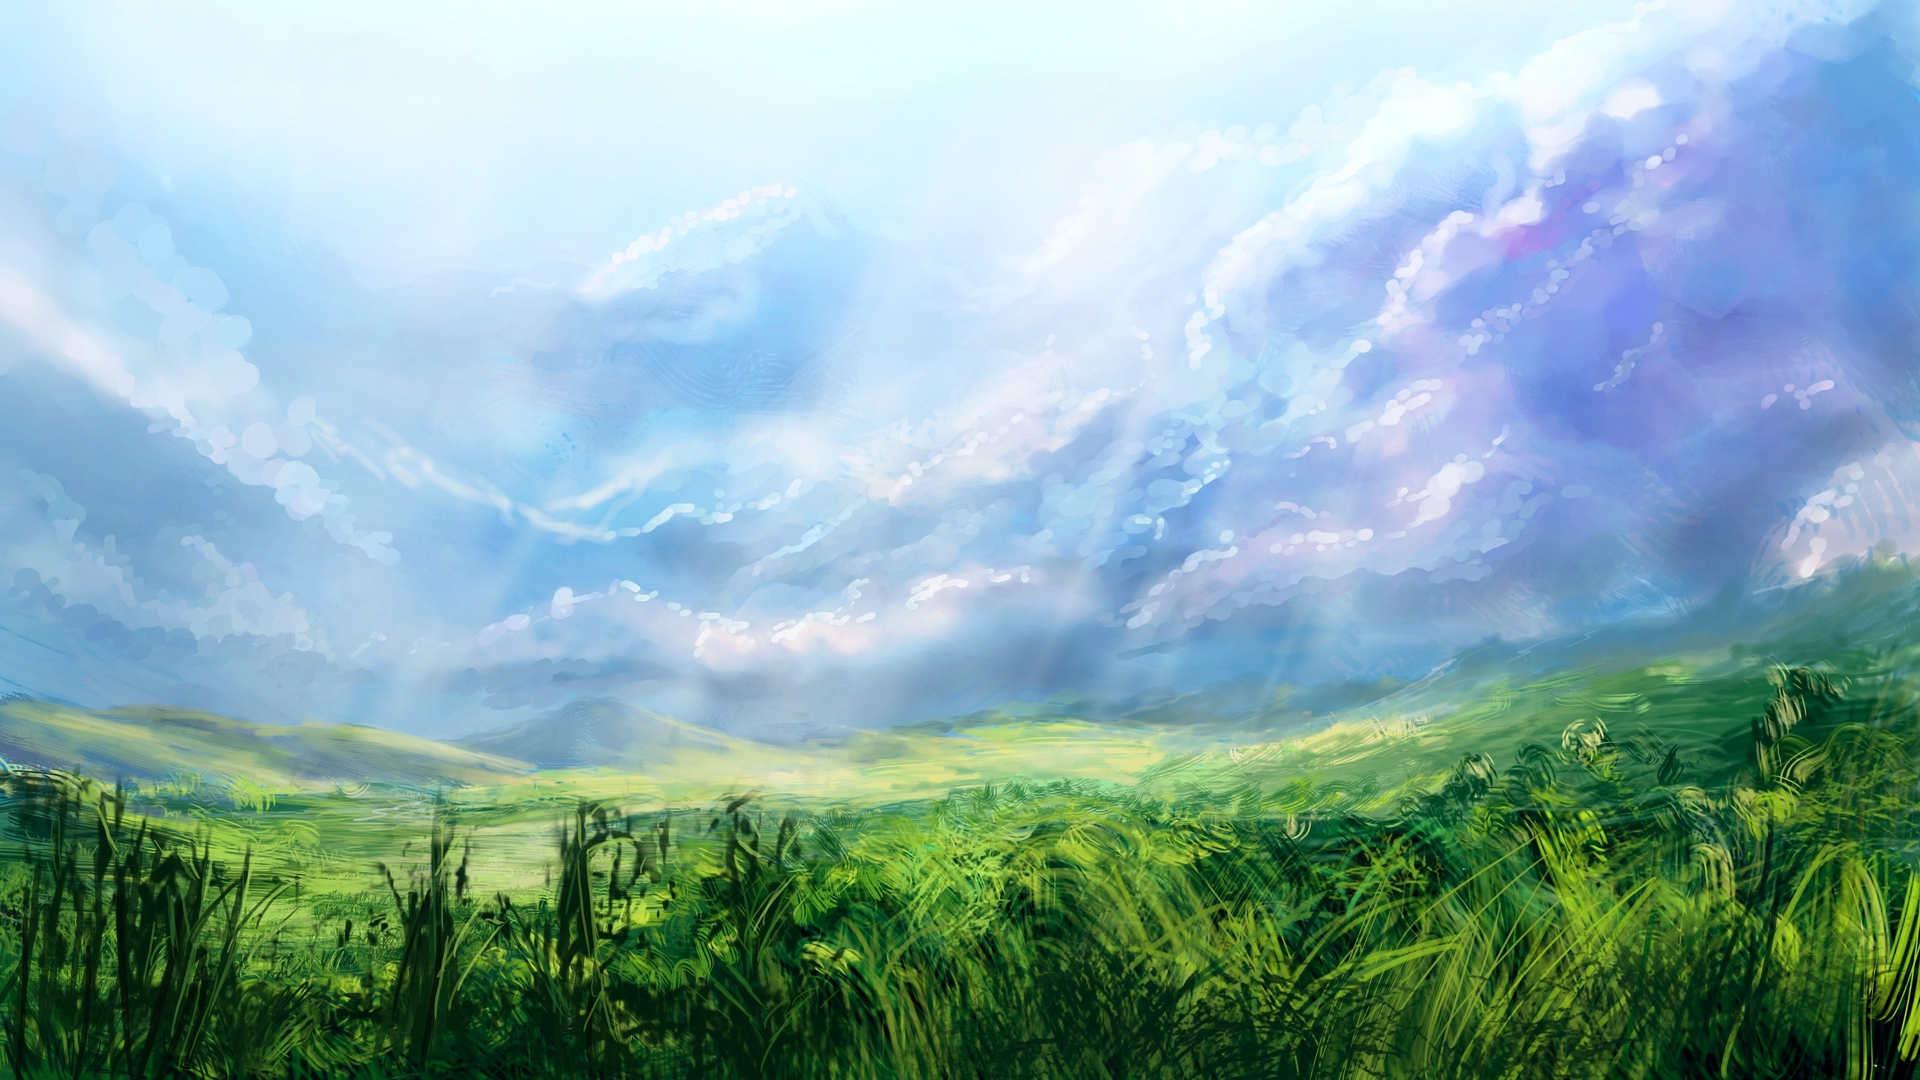 природа трава облака небо камни в хорошем качестве